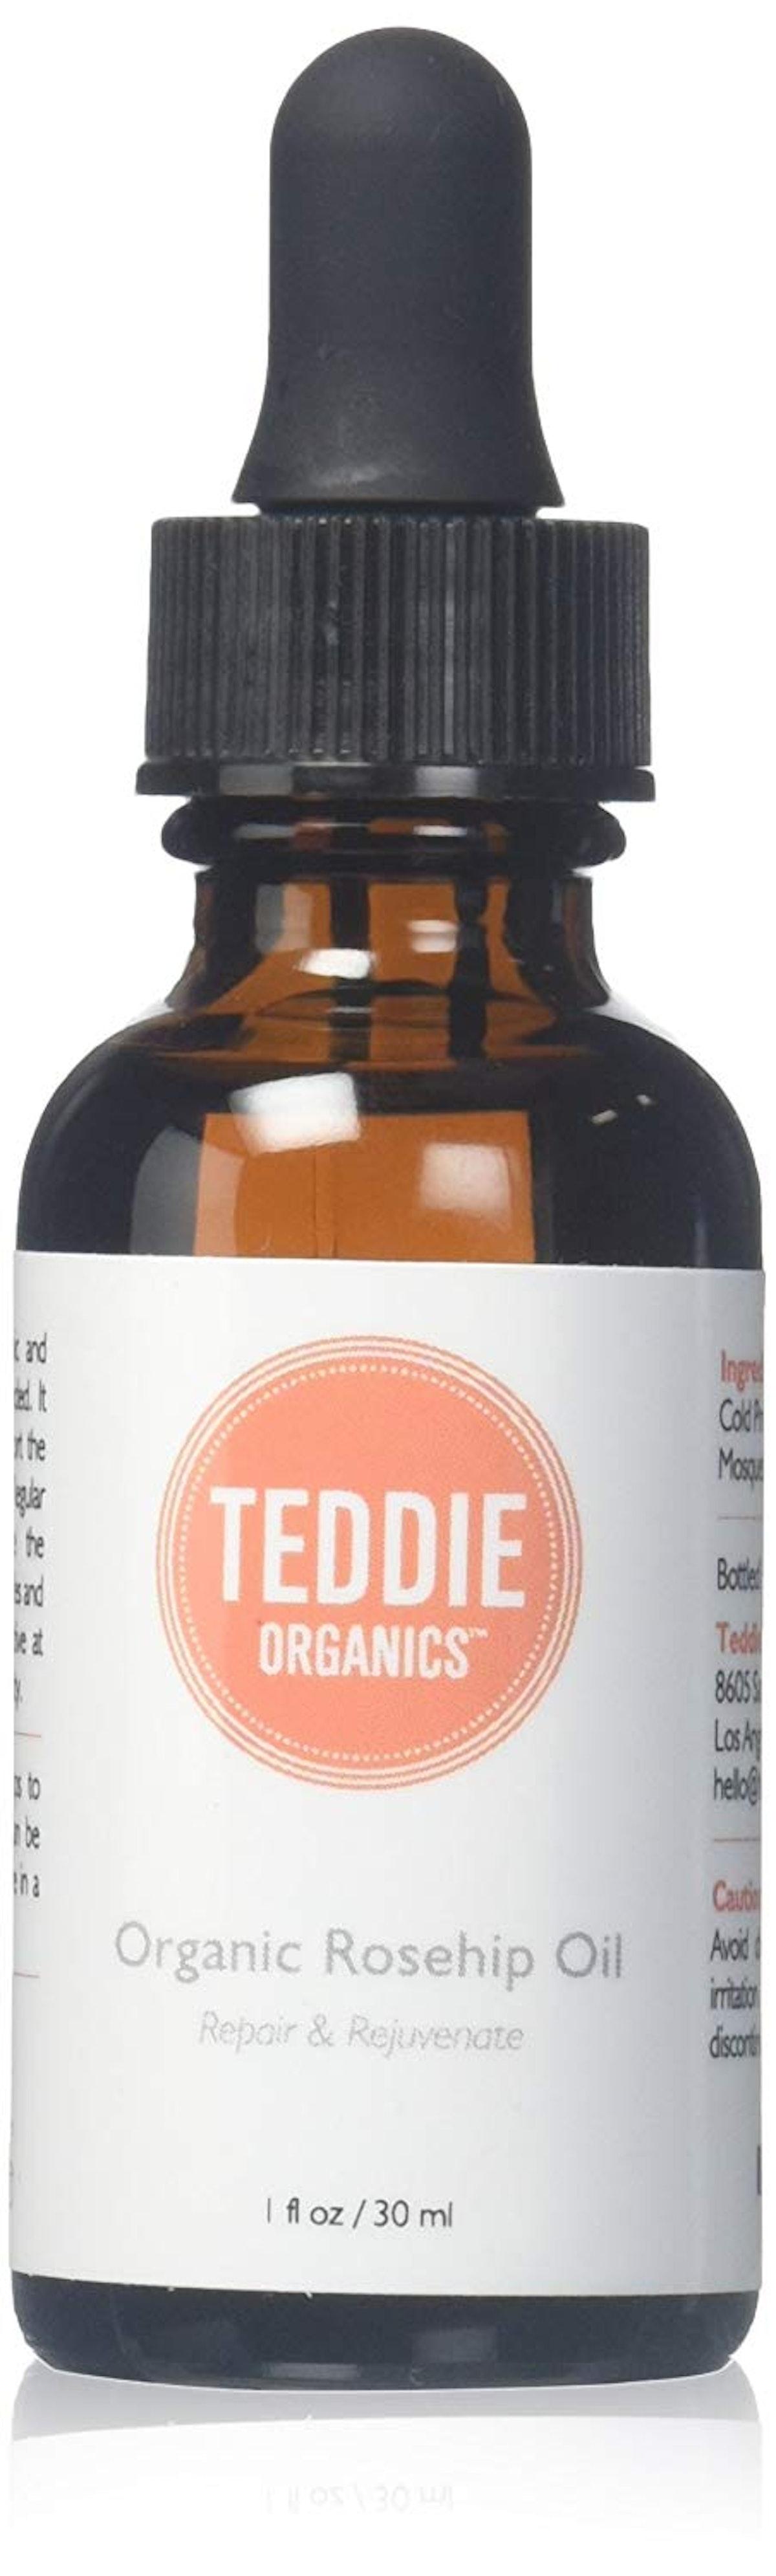 Teddie Organics Organic Rosehip Oil